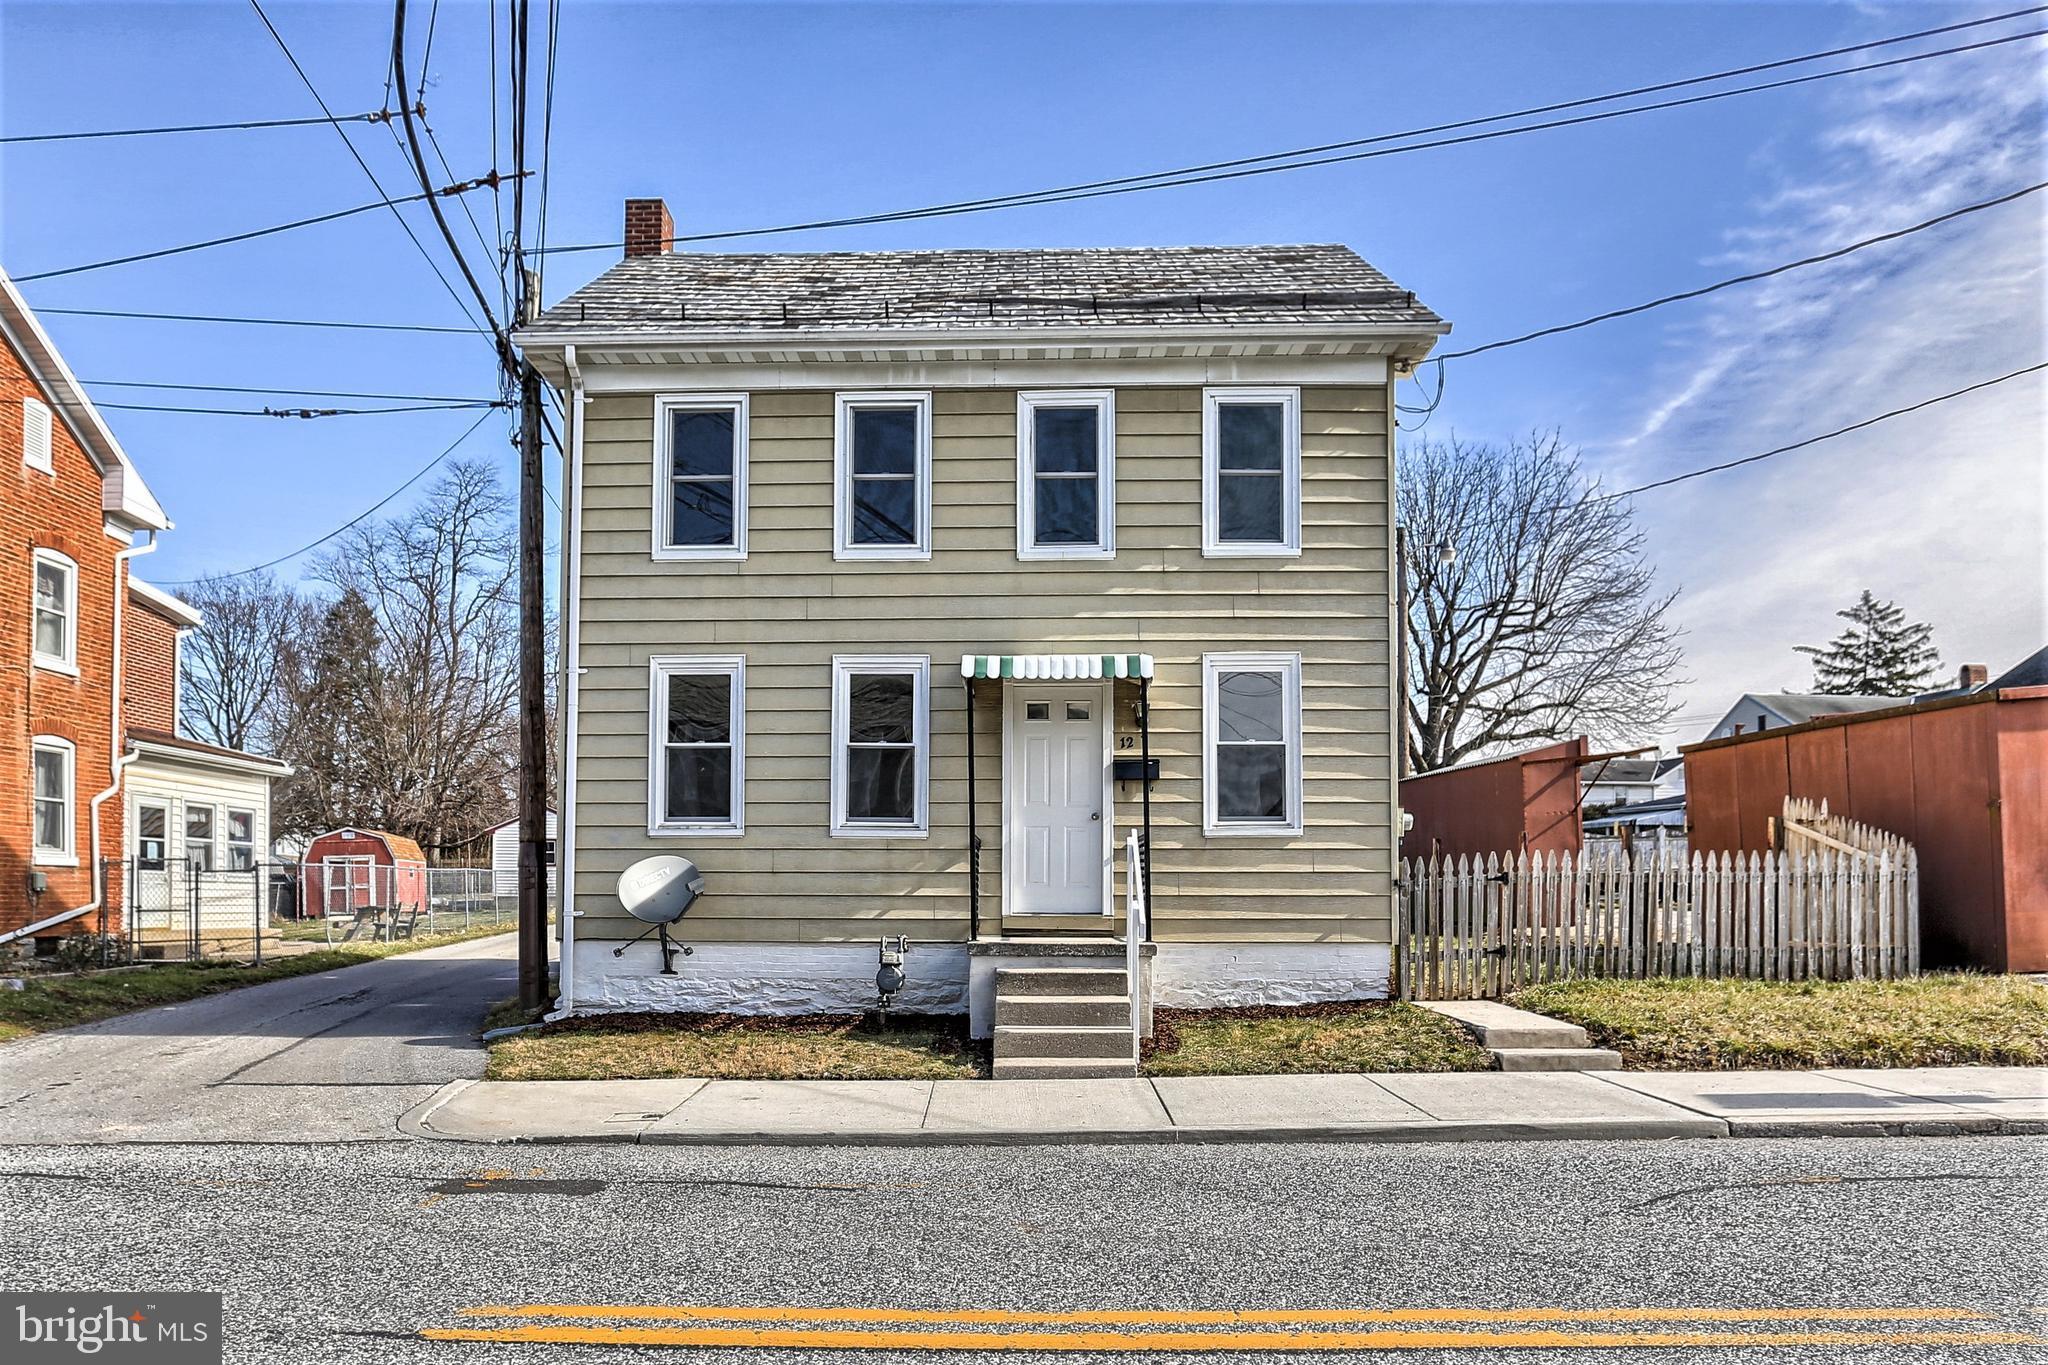 12 N 2ND STREET, MCSHERRYSTOWN, PA 17344